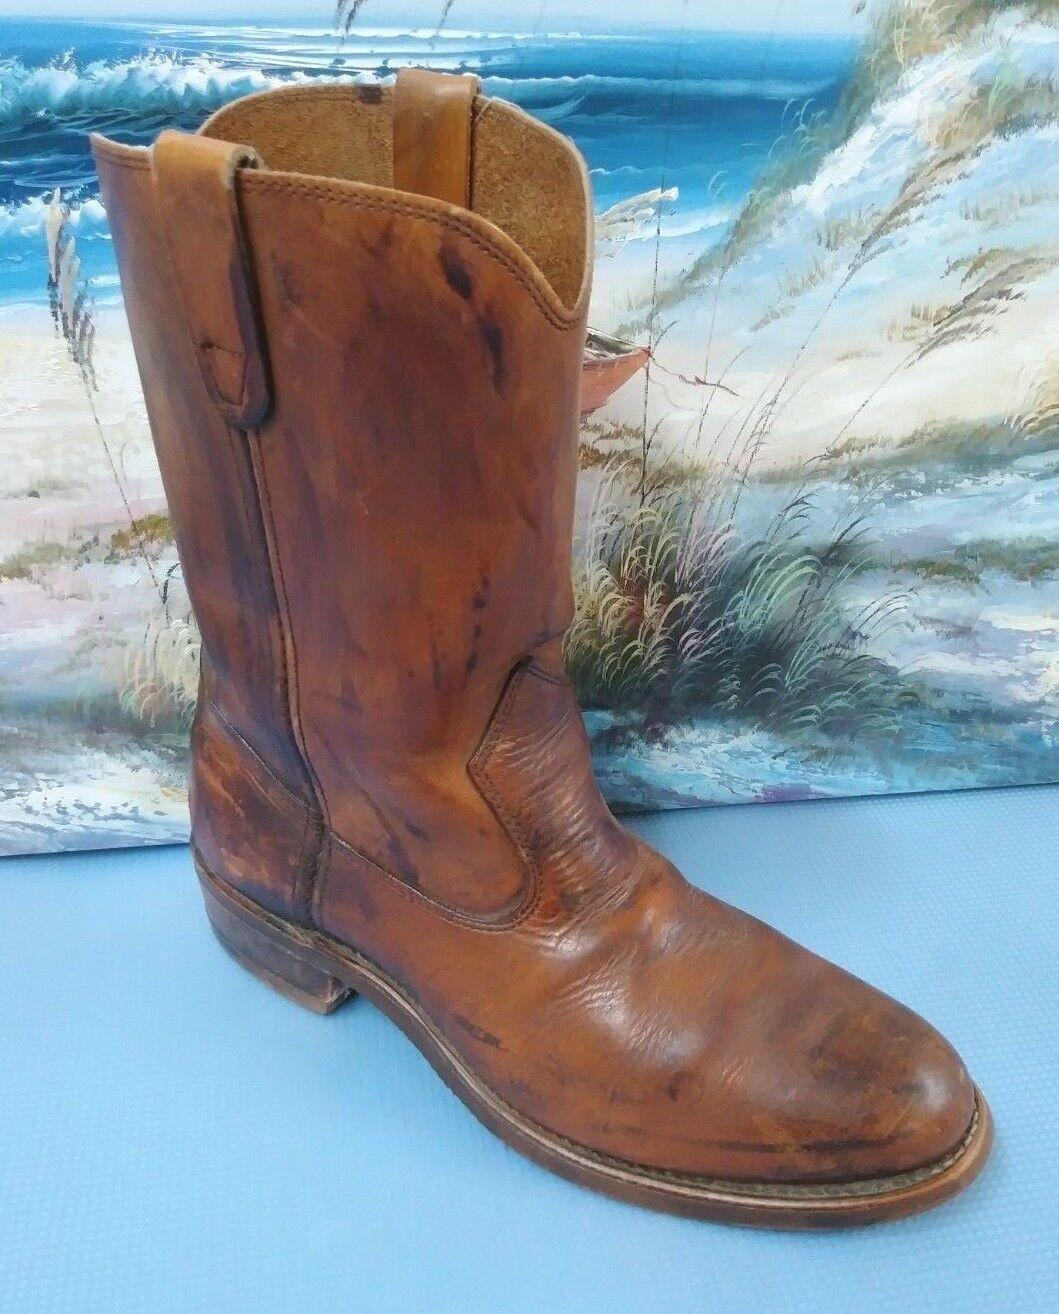 Men's Vintage Brown Western Leather Cowboy Boots Size 9